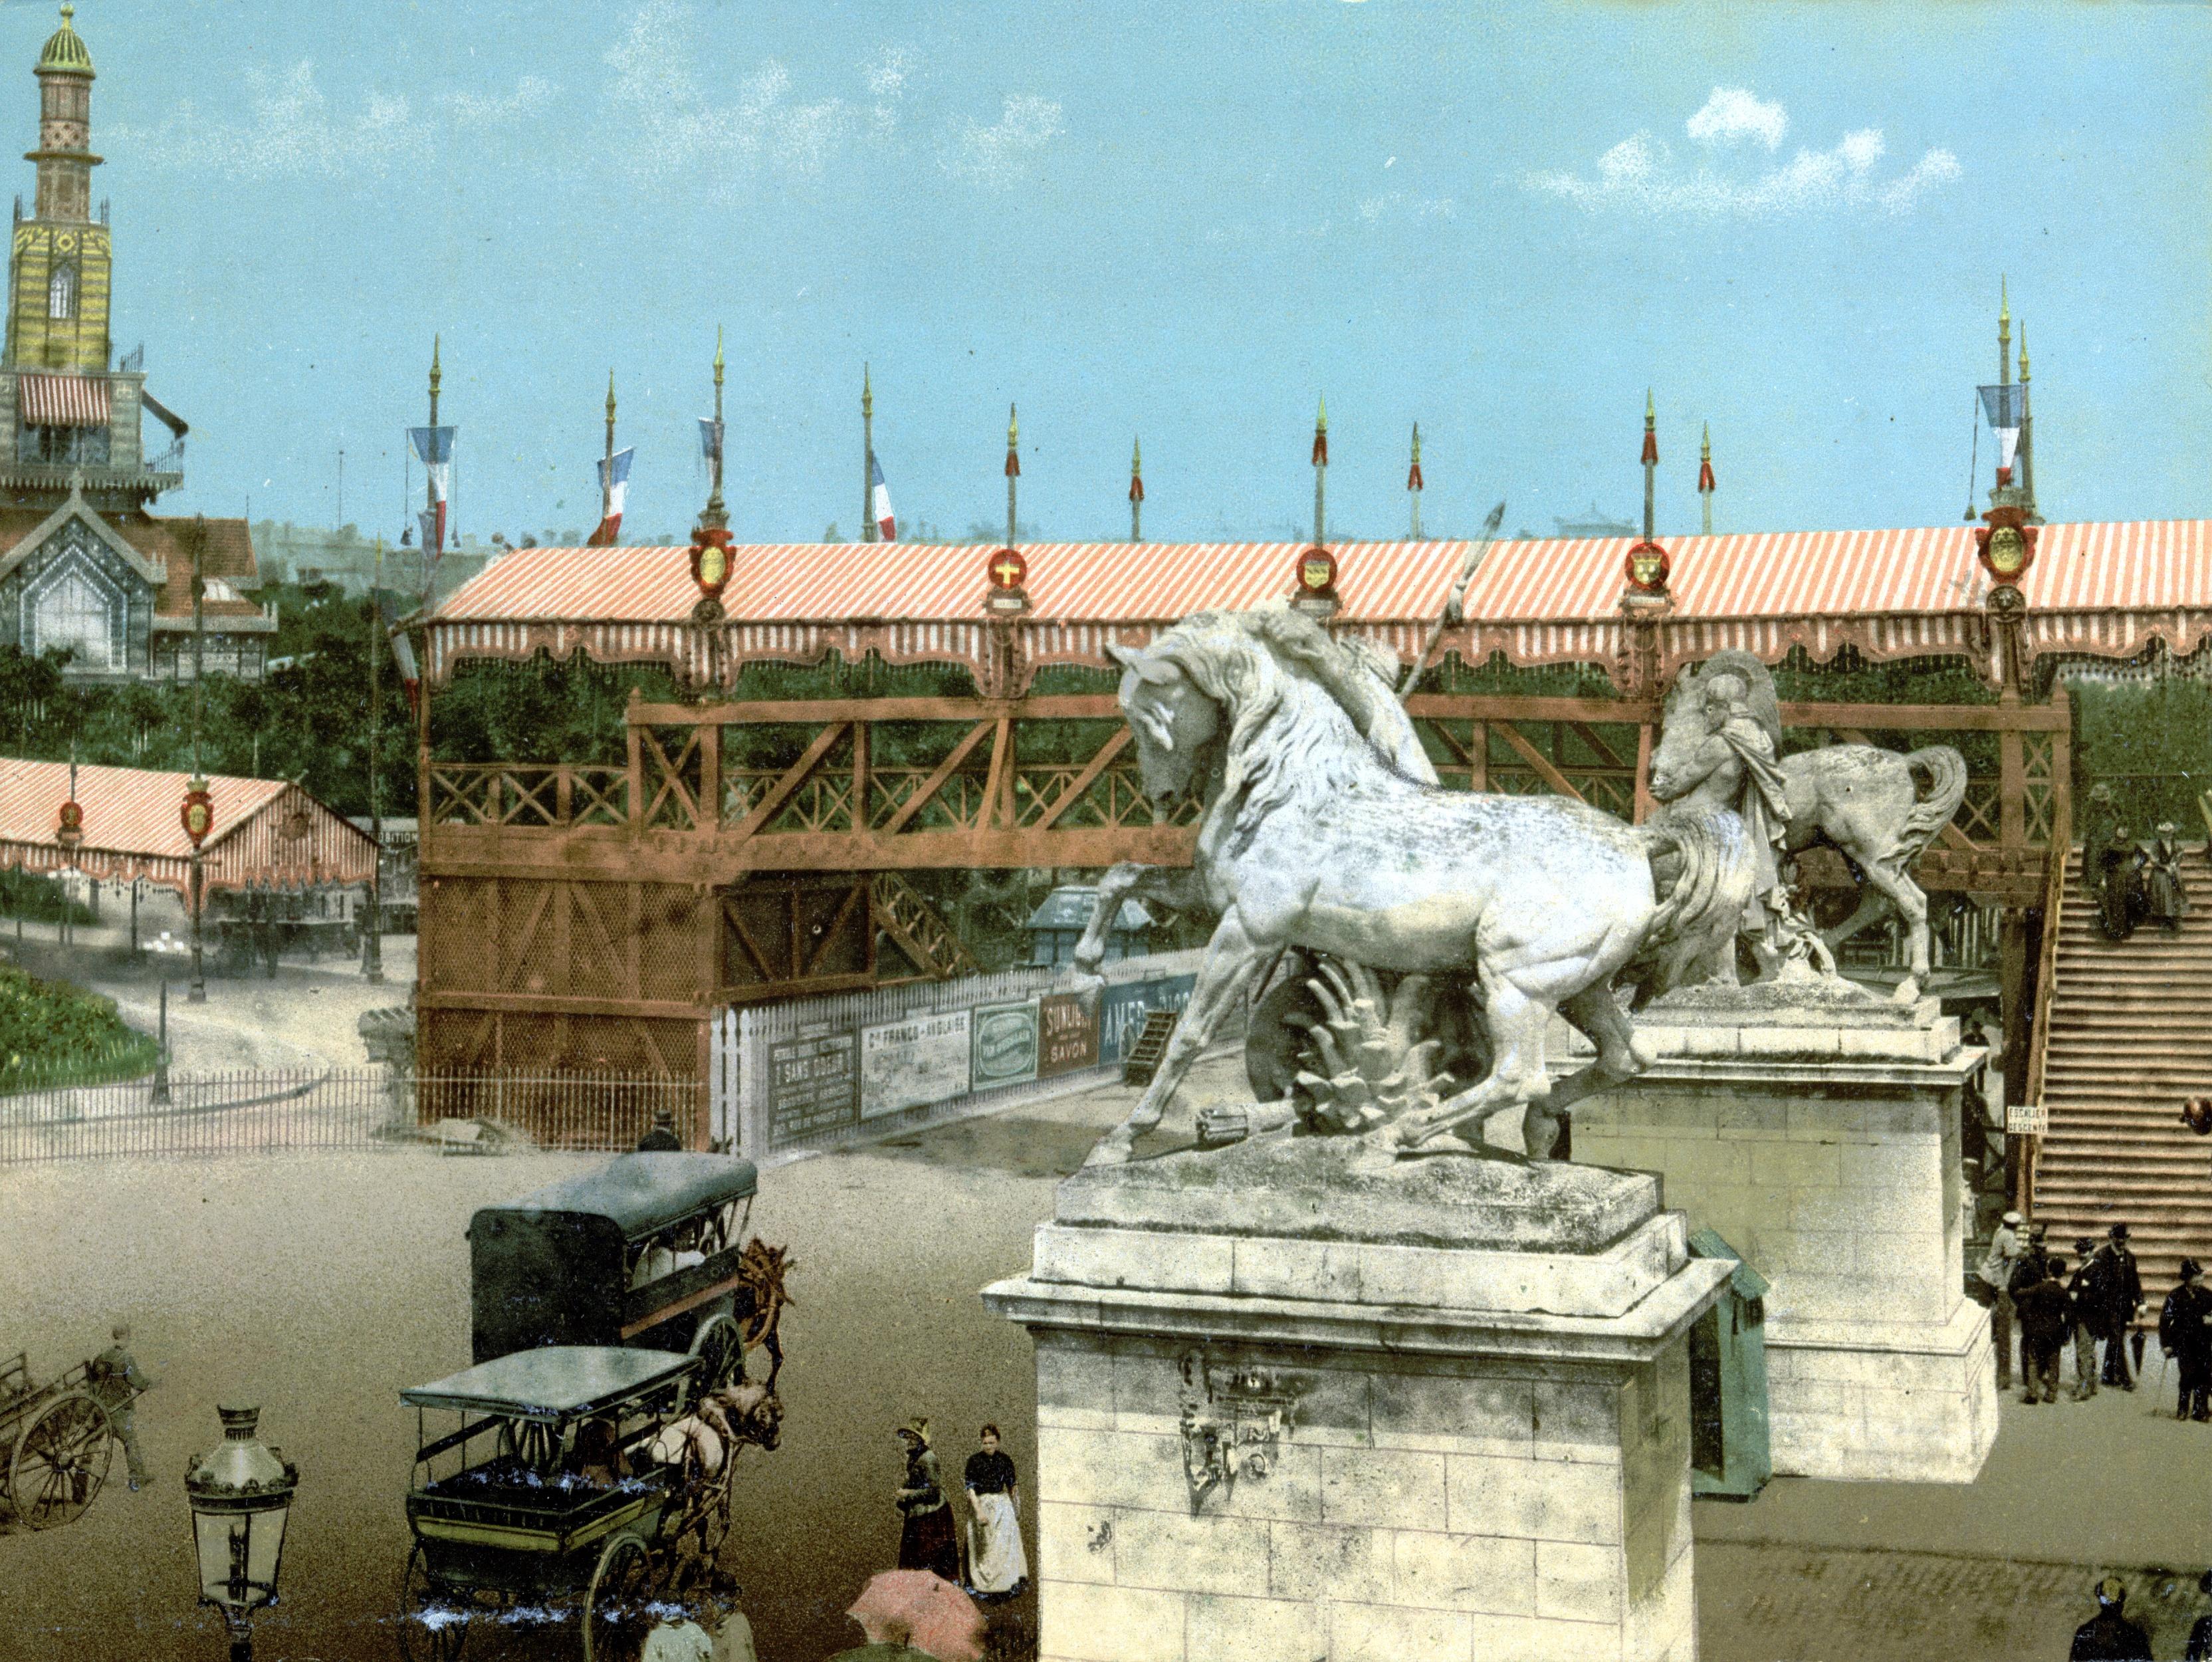 file exposition universal  1889  paris  france 3 jpg